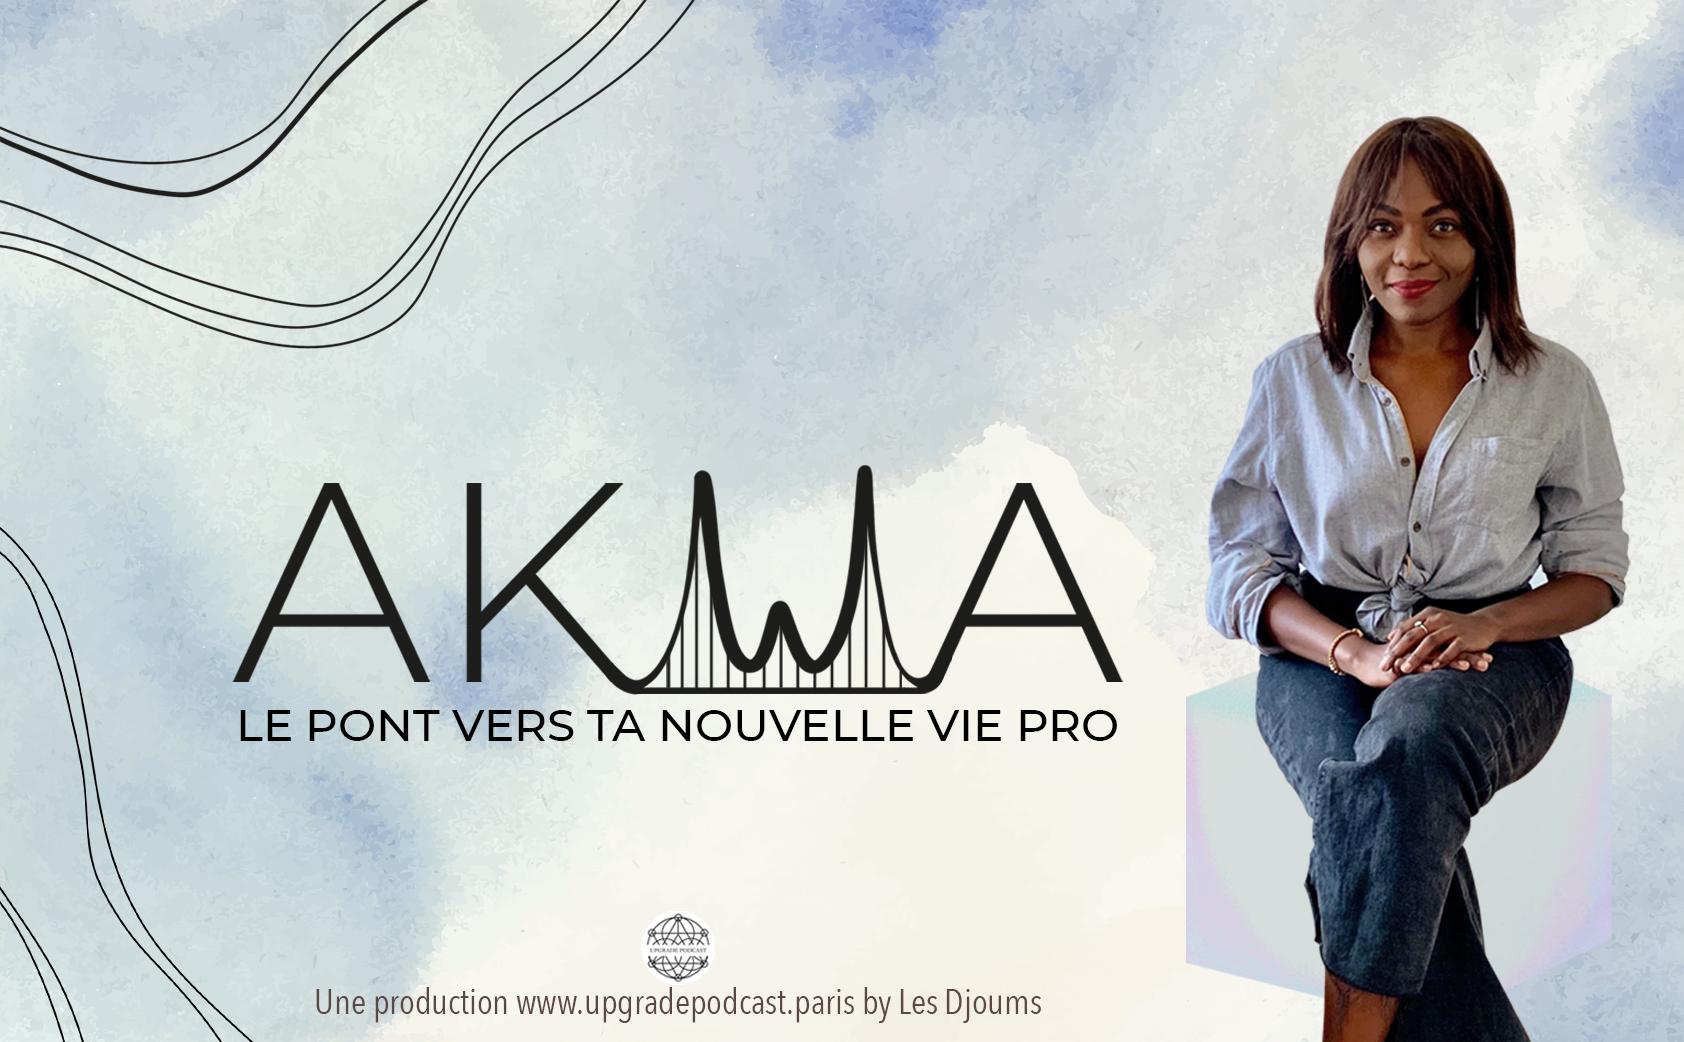 AKWA Podcast